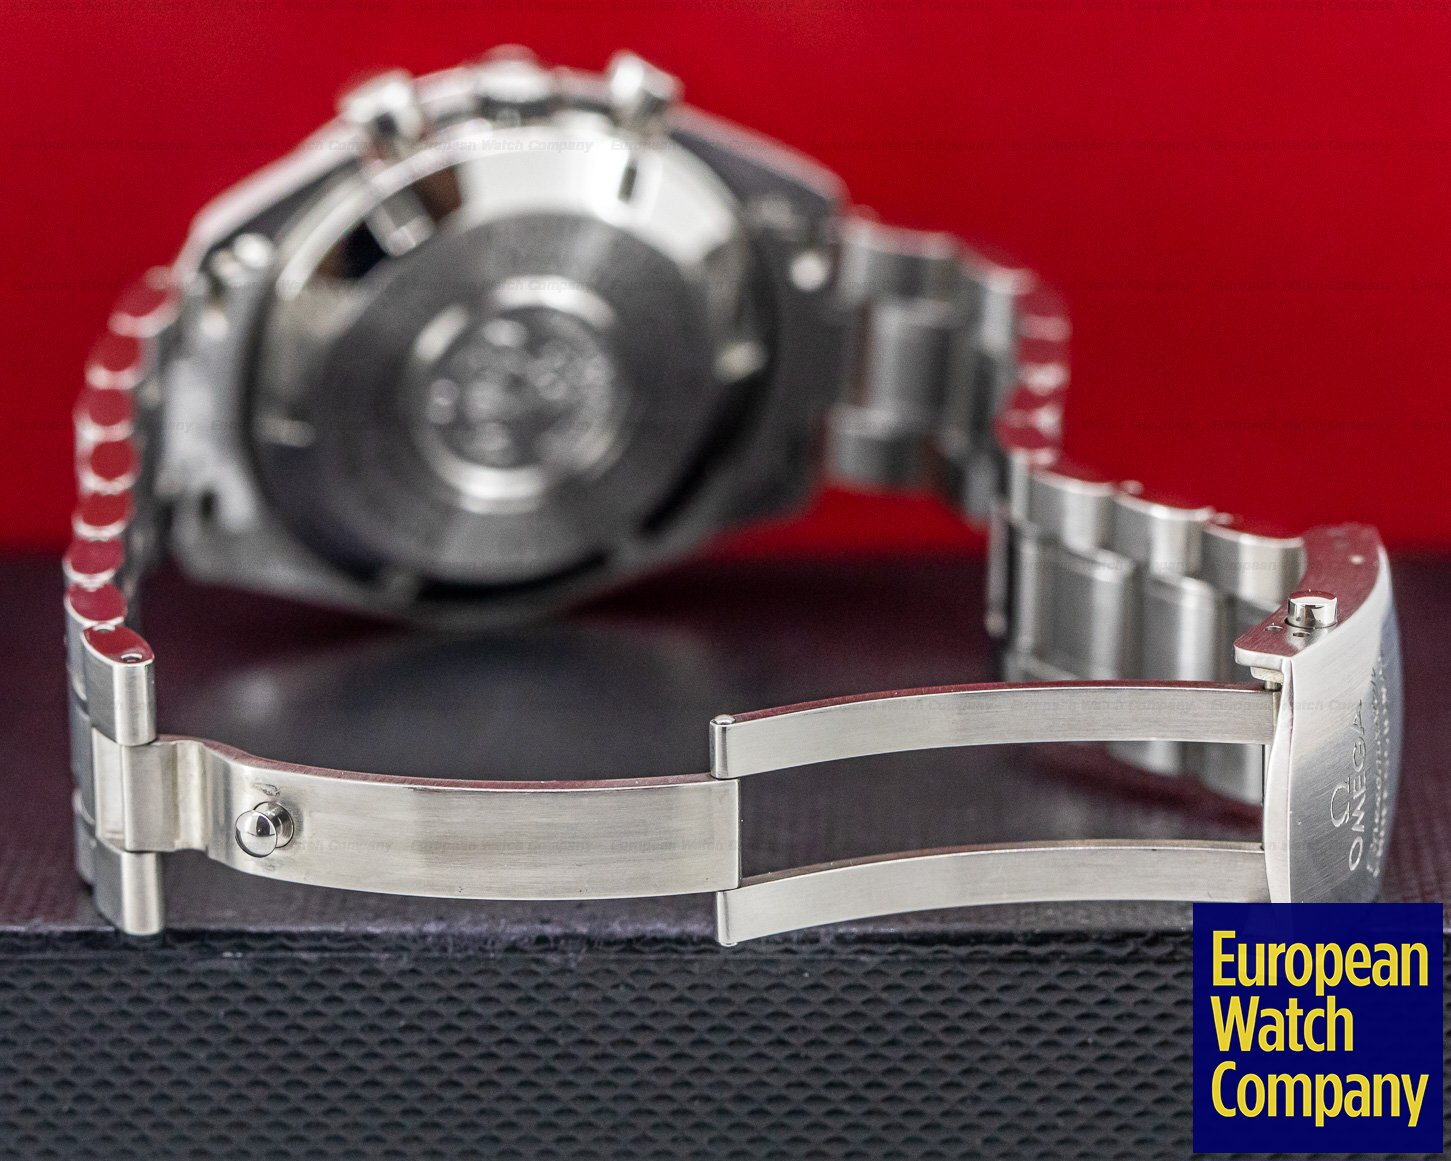 Omega 3570.50.00 Speedmaster Professional Black Dial SS / SS